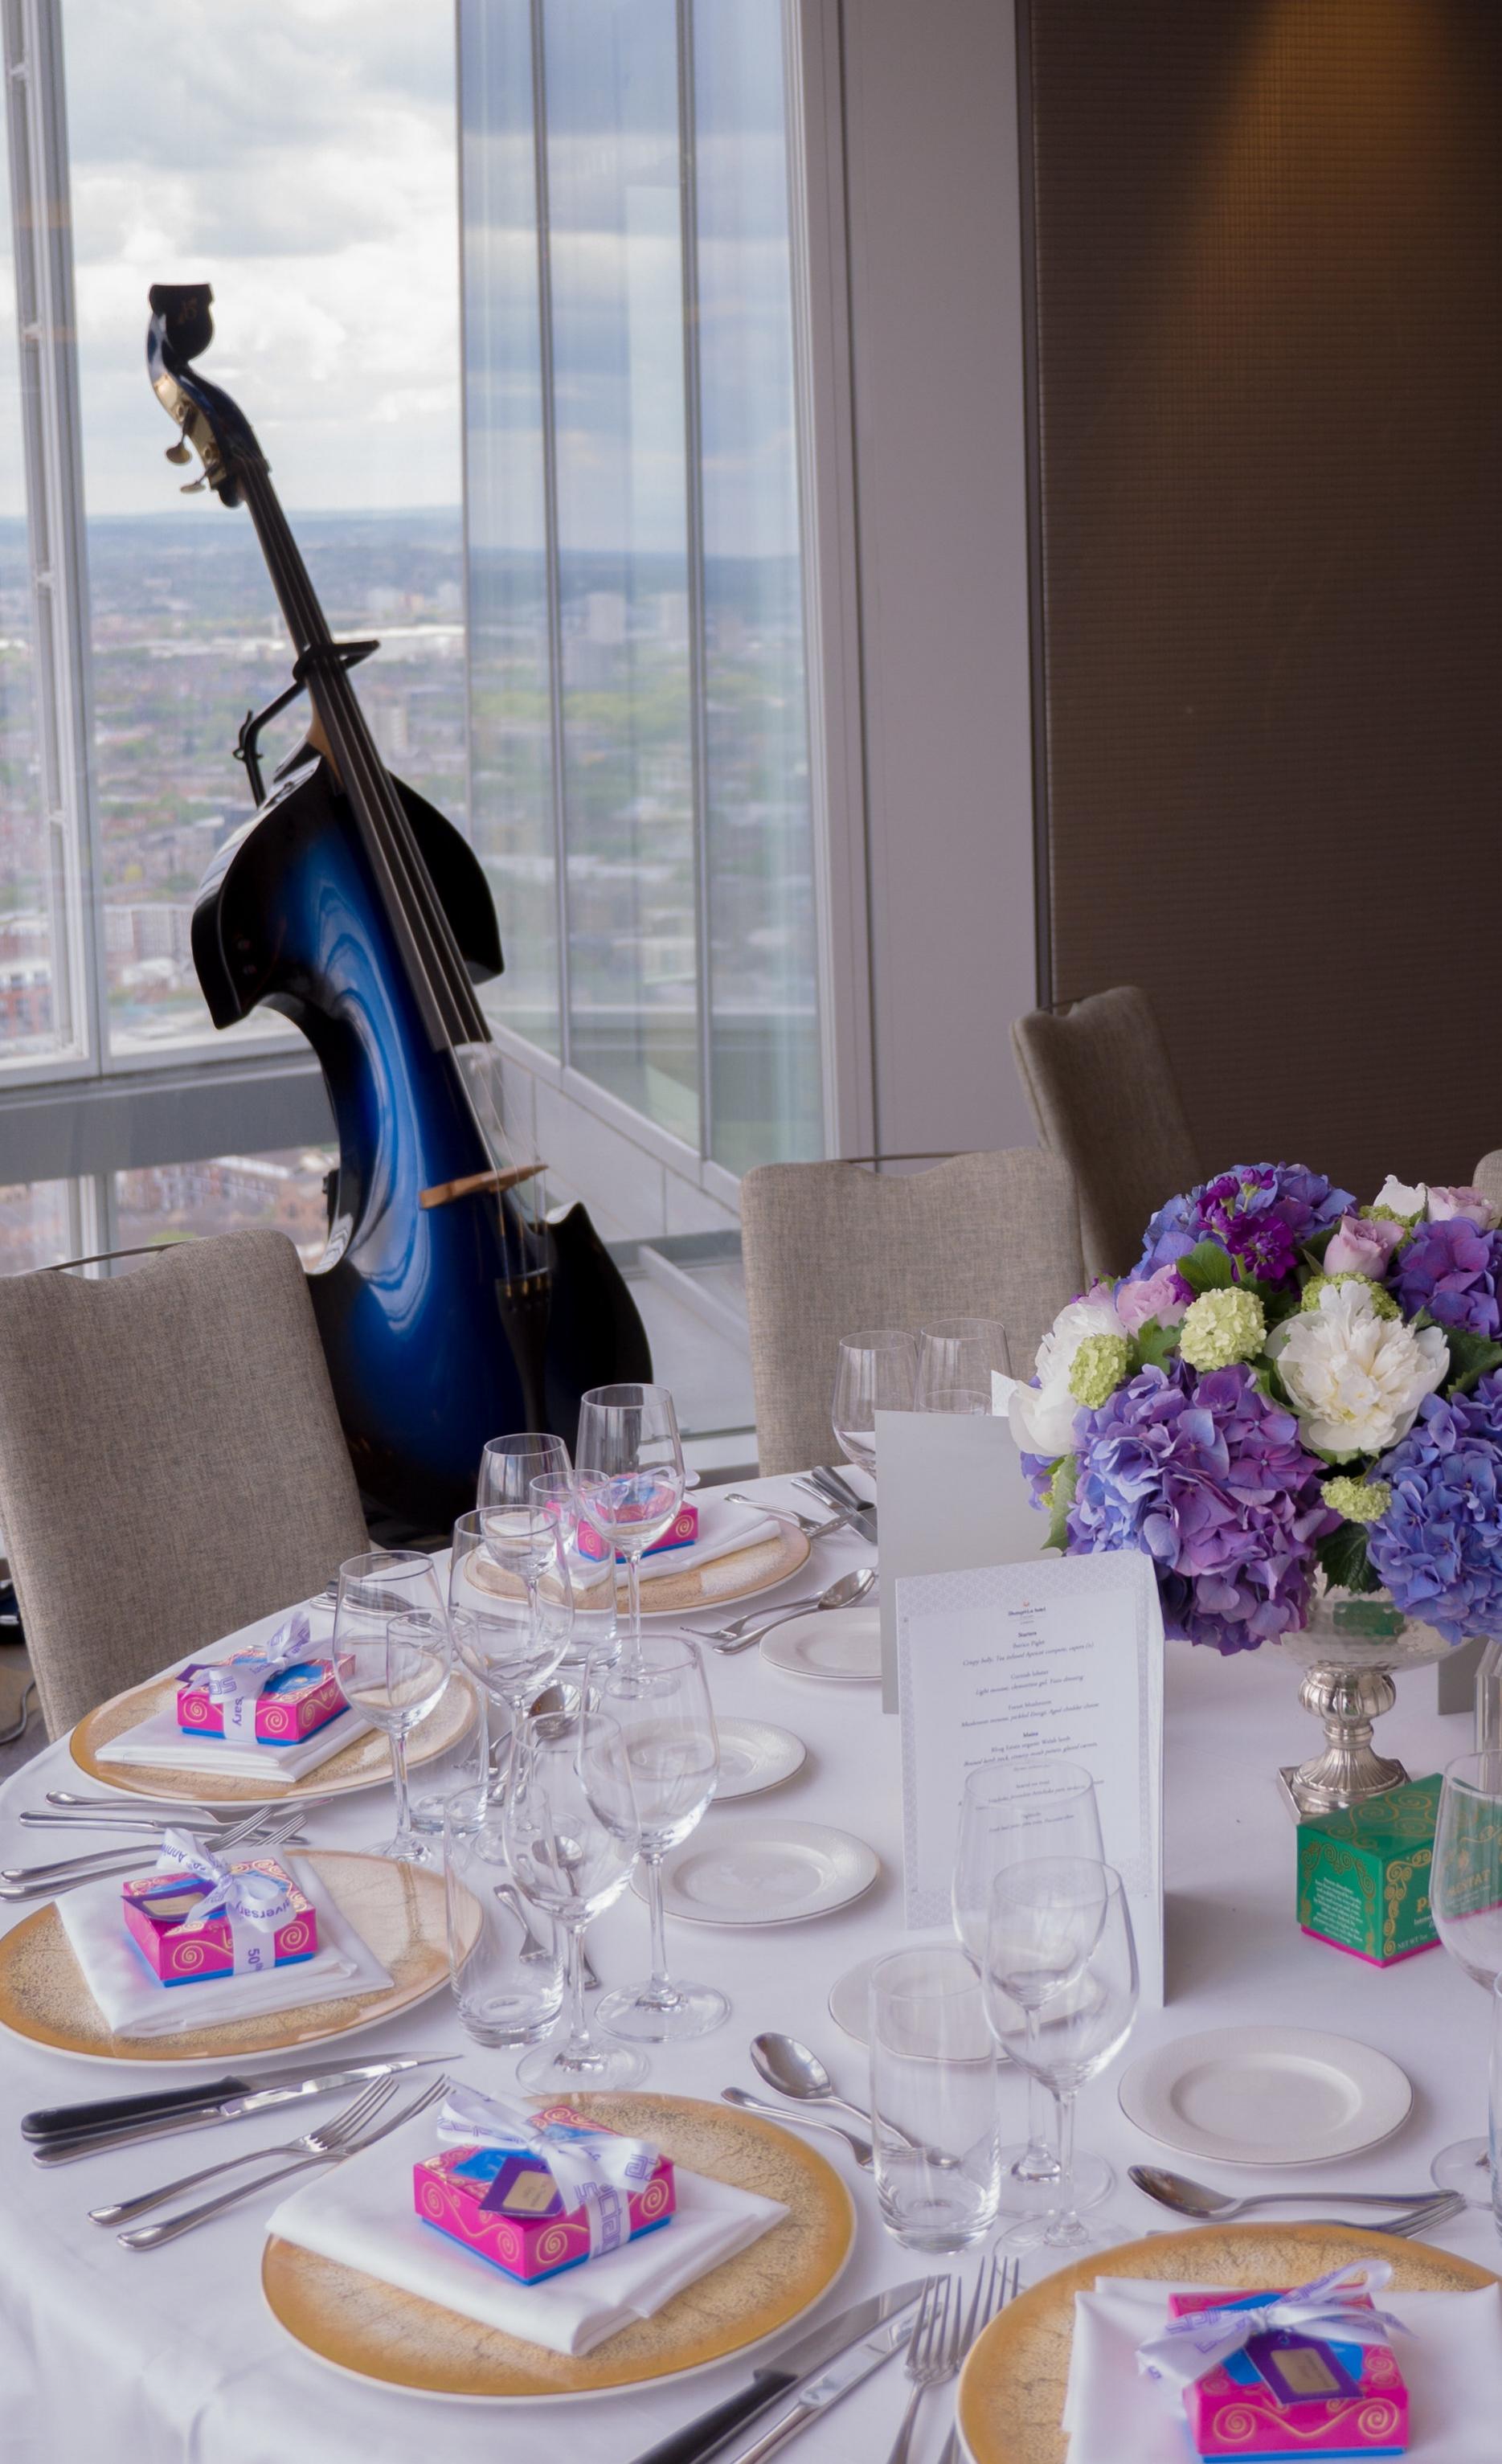 Bass on table elec.jpg